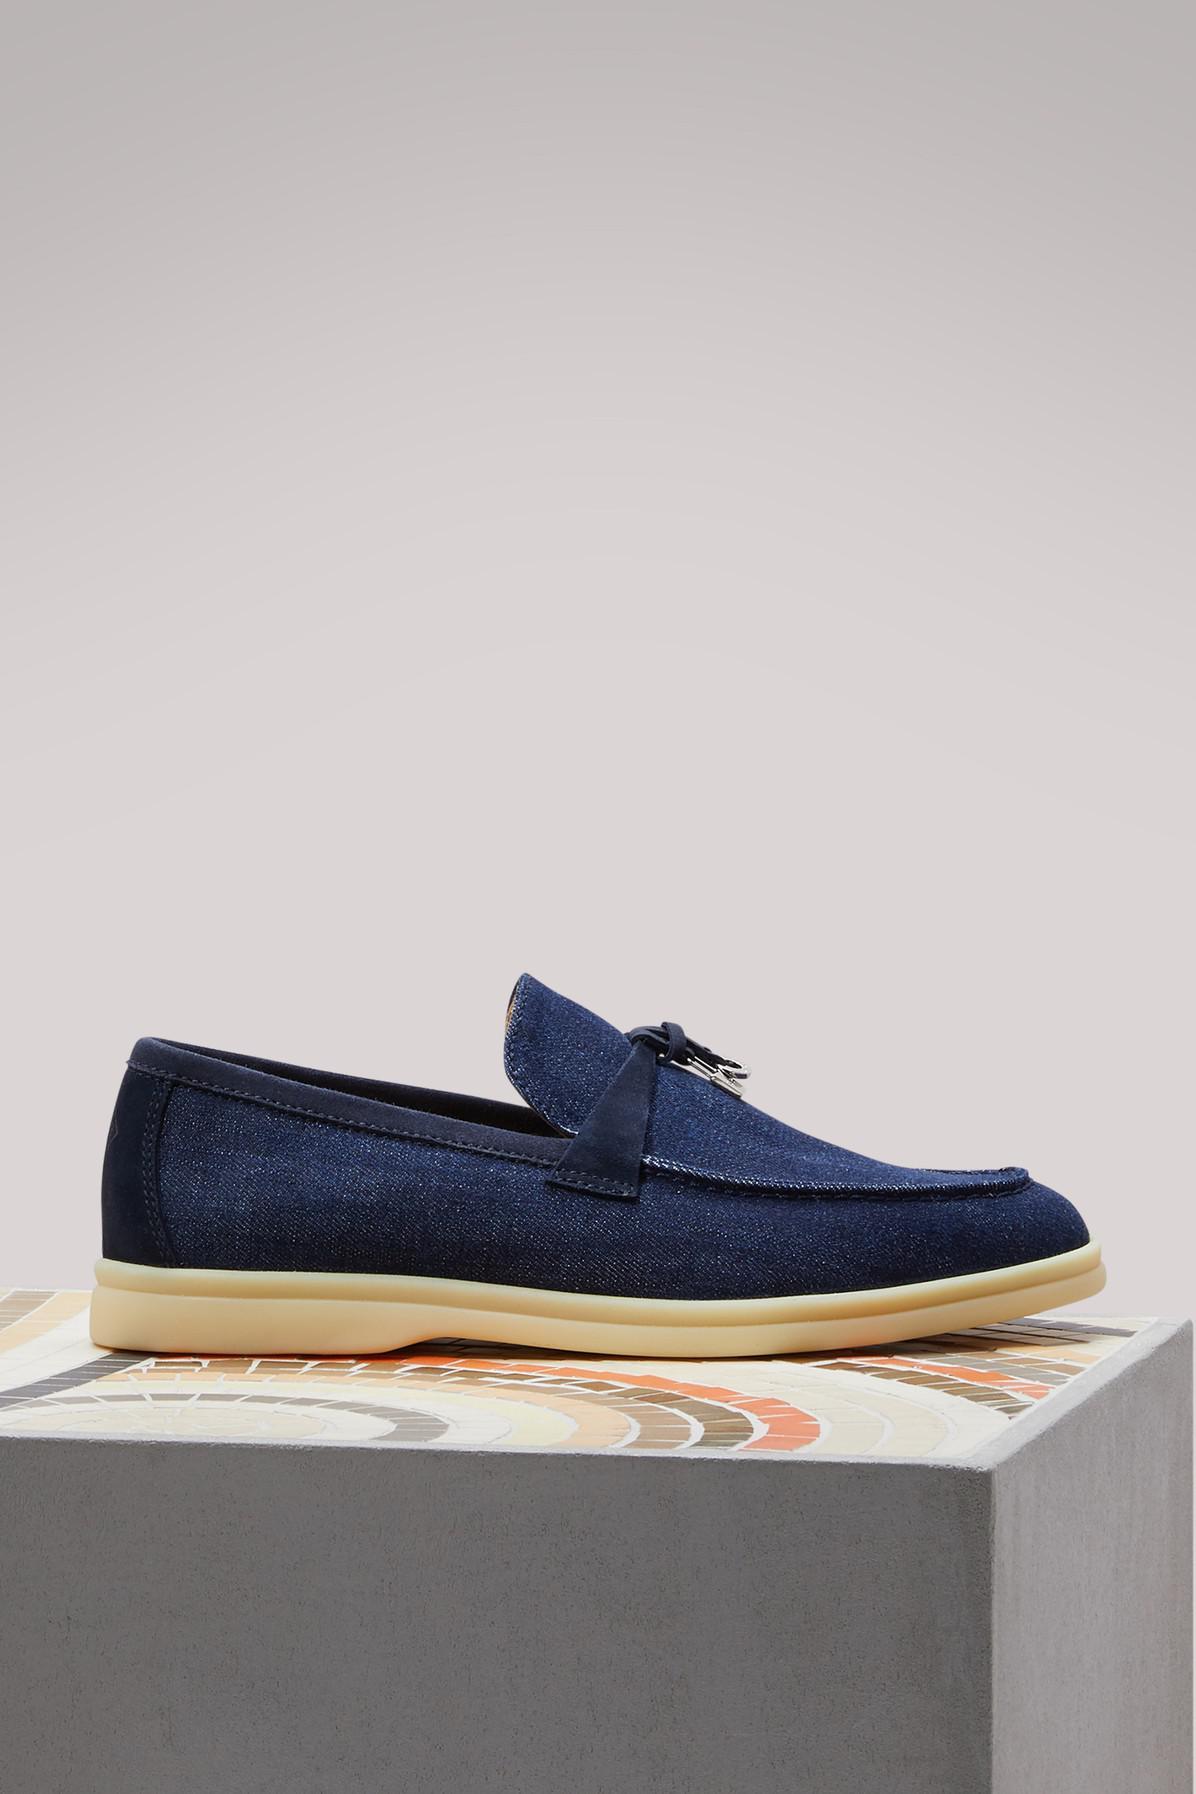 206dbfec4d7 Lyst - Loro Piana Summer Charm Denim Slippers in Blue